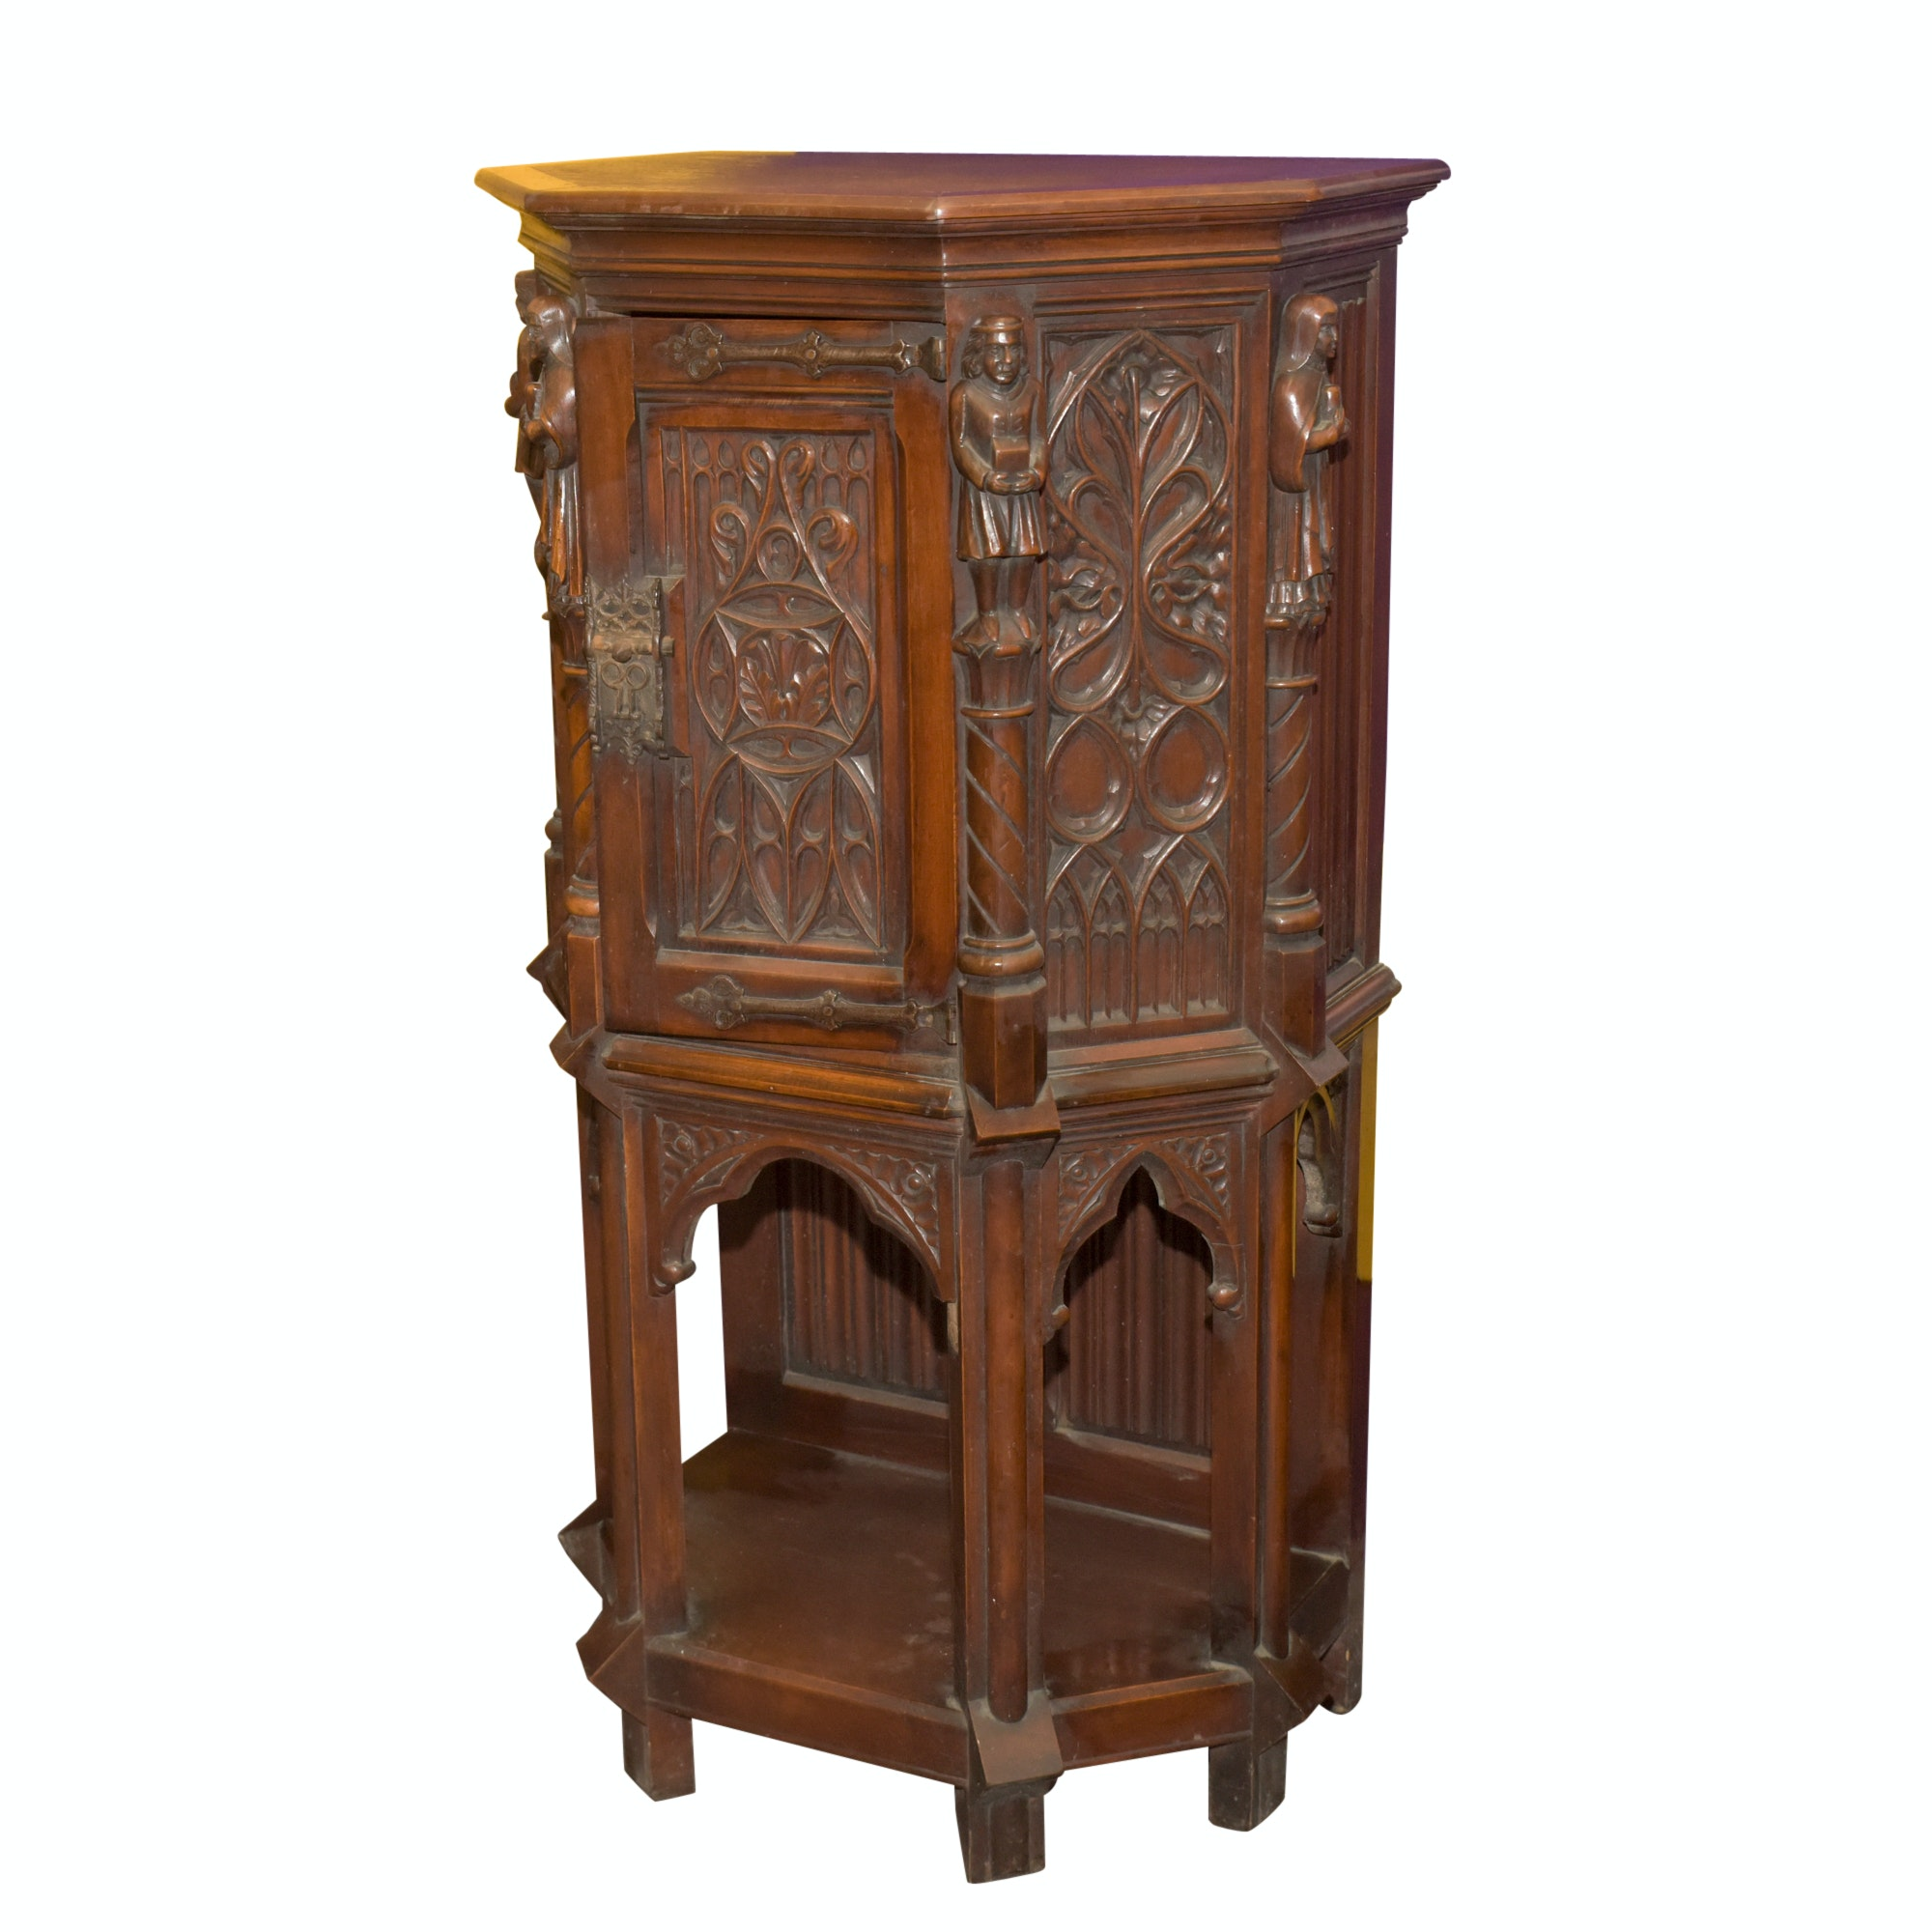 Vintage Renaissance Revival Style Carved Wood Cabinet